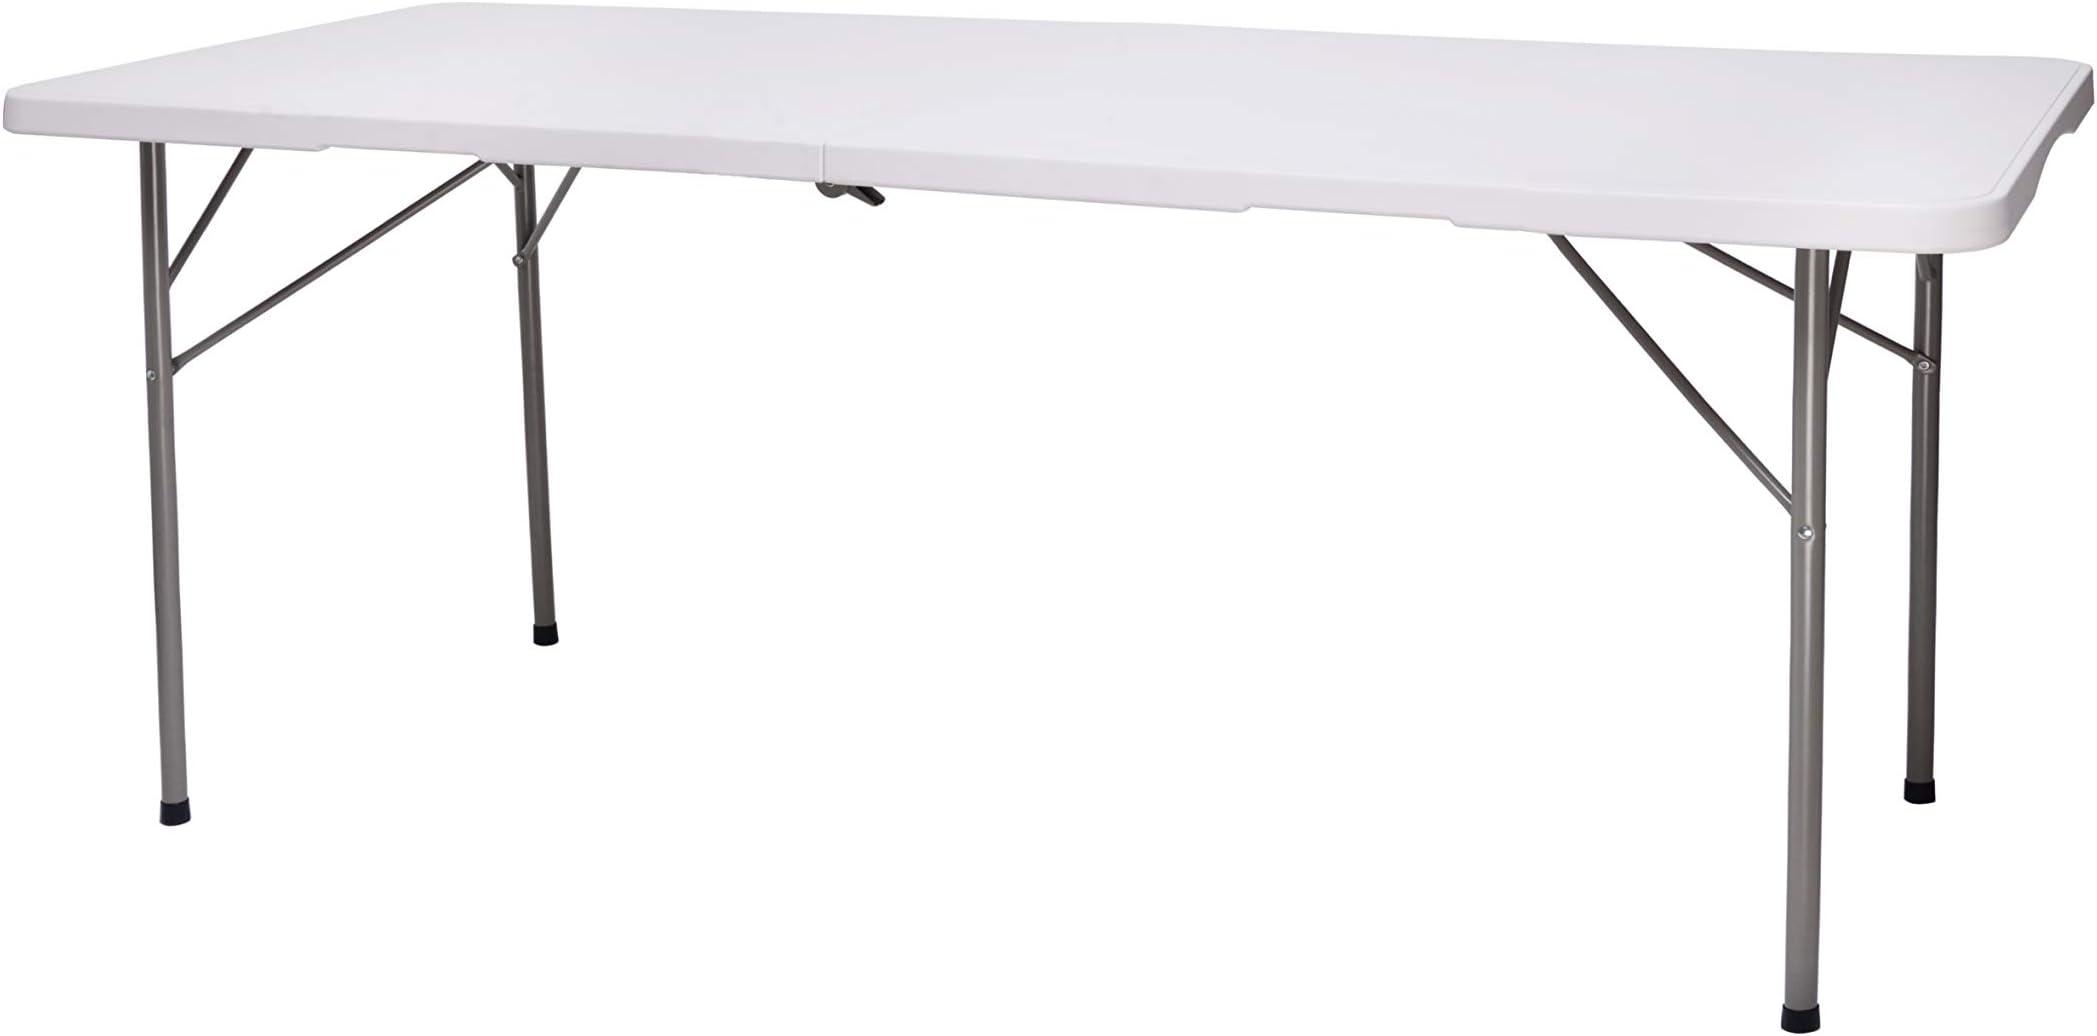 amazon co uk tables kitchen furniture home kitchen rh amazon co uk